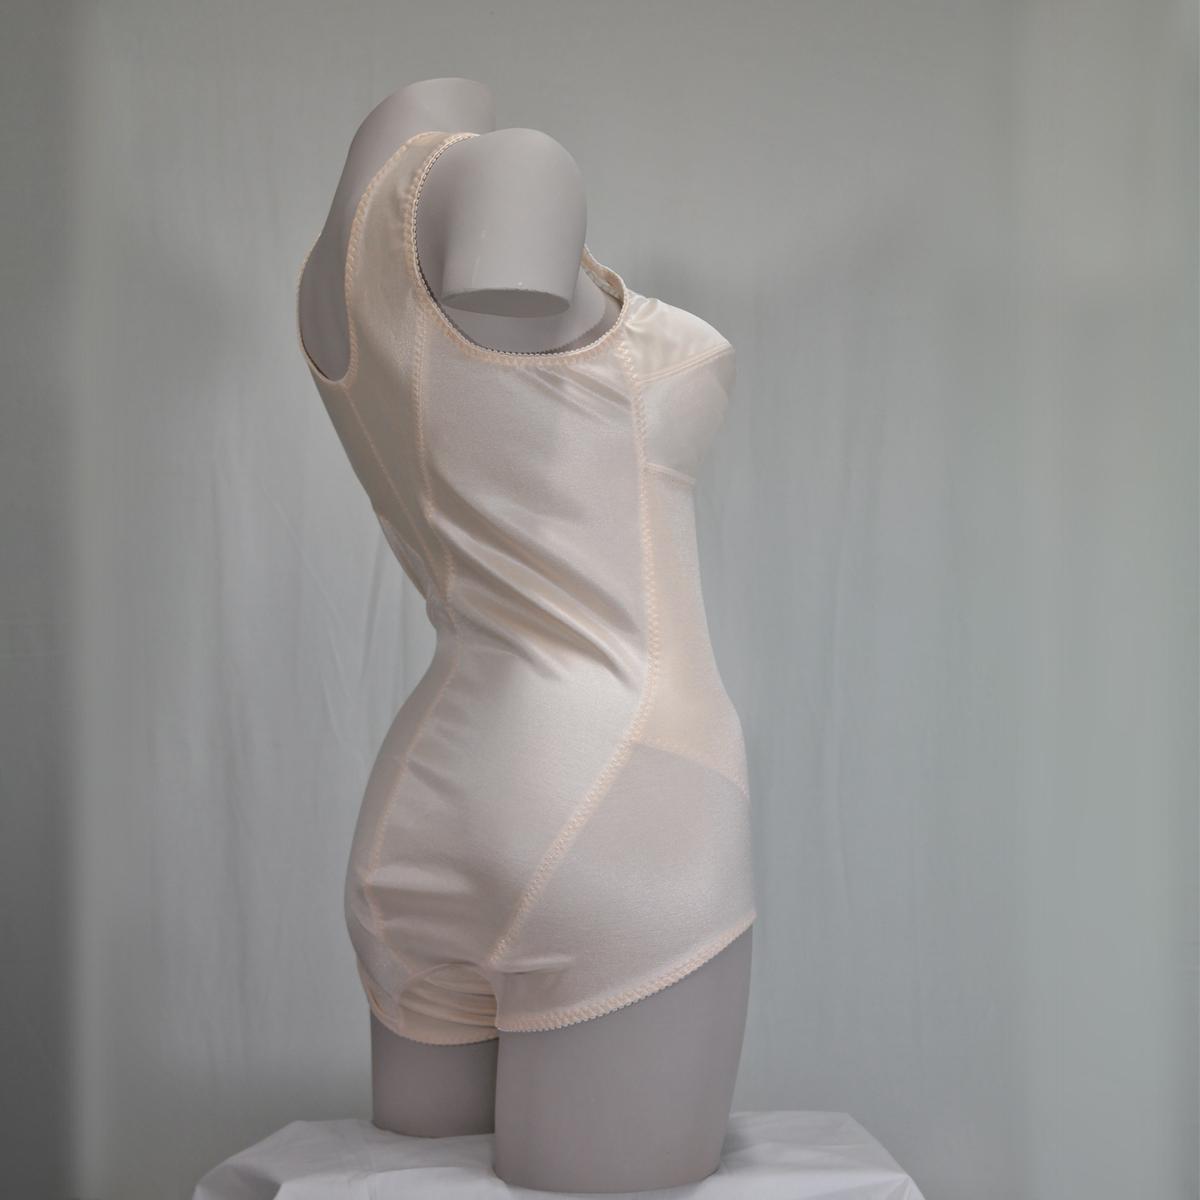 Body cremallera Braga (Alivio de Espalda) - Anita